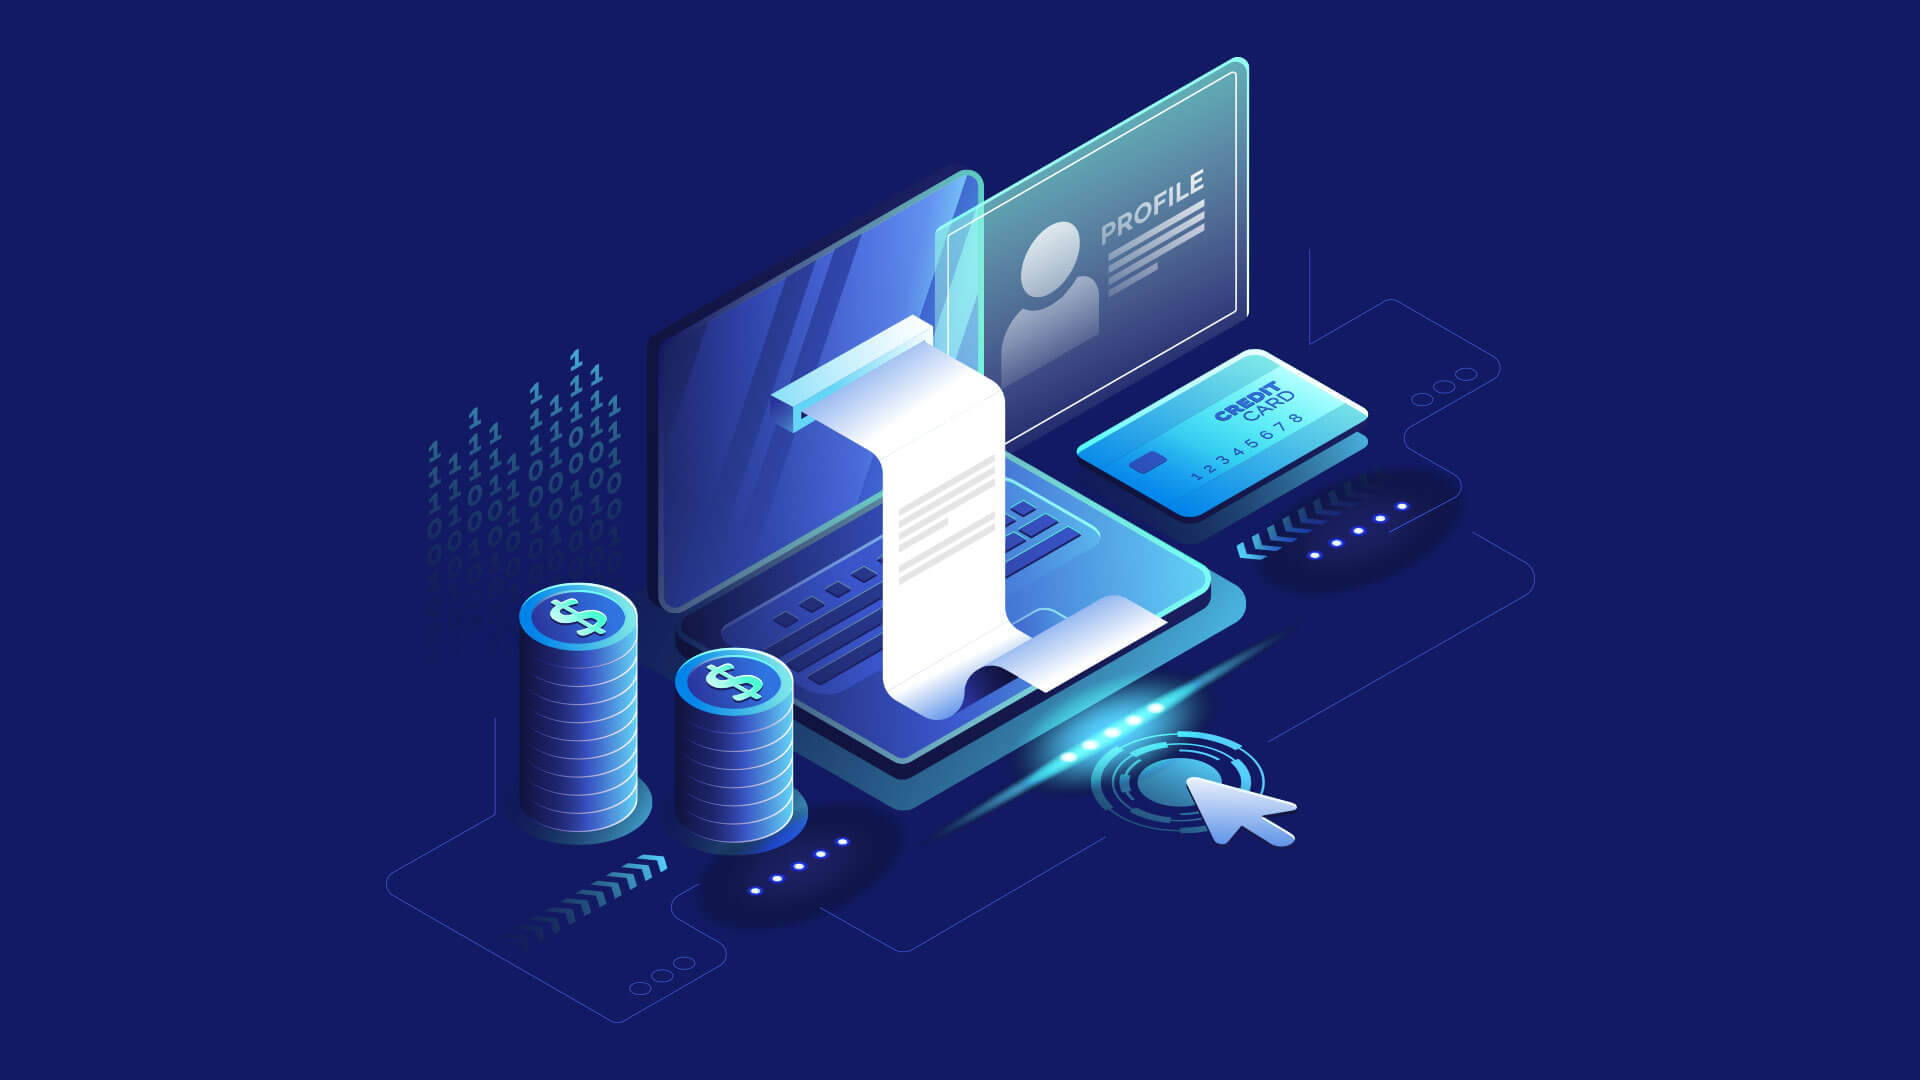 Online Πληρωμές Μέσω Ιστοσελίδας